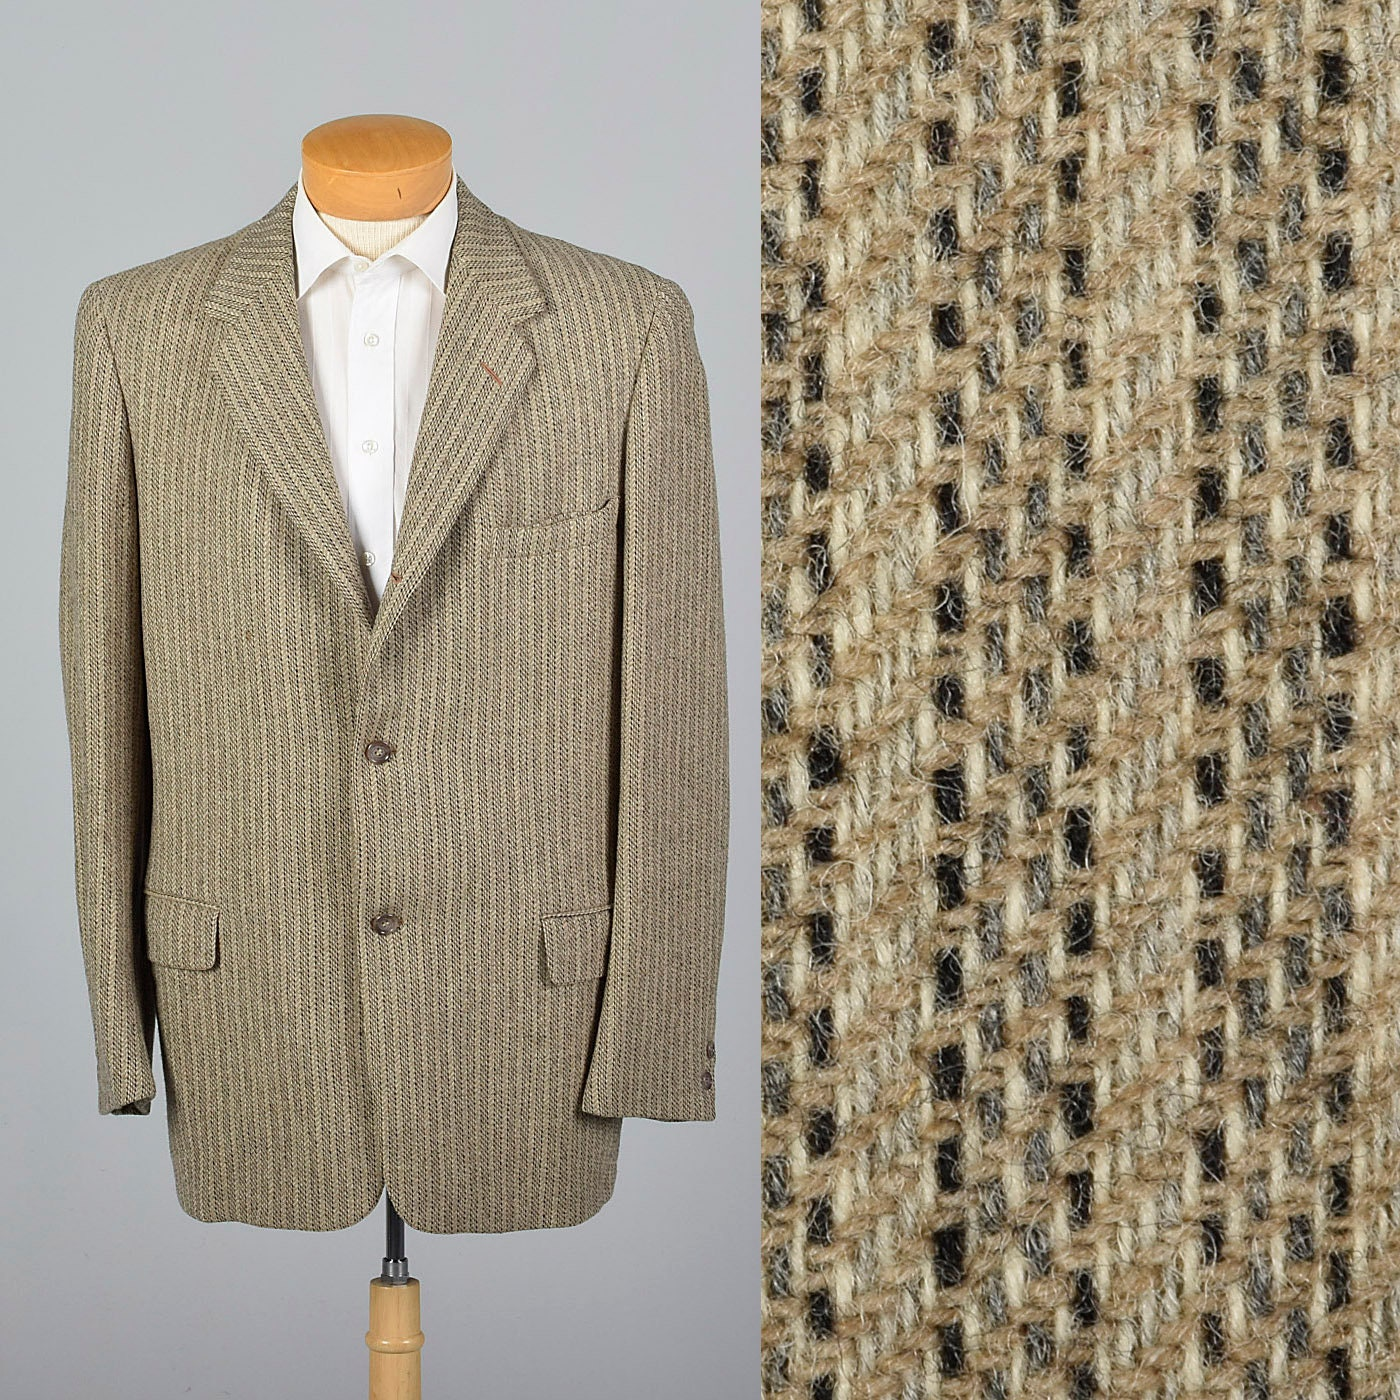 1950s Mens Hats | 50s Vintage Men's Hats xl 44L 1950S Mens Tan Tweed Striped Sportcoat Single Vent Medium Lapels Convertible Pockets 50S Vintage Jacket $0.00 AT vintagedancer.com